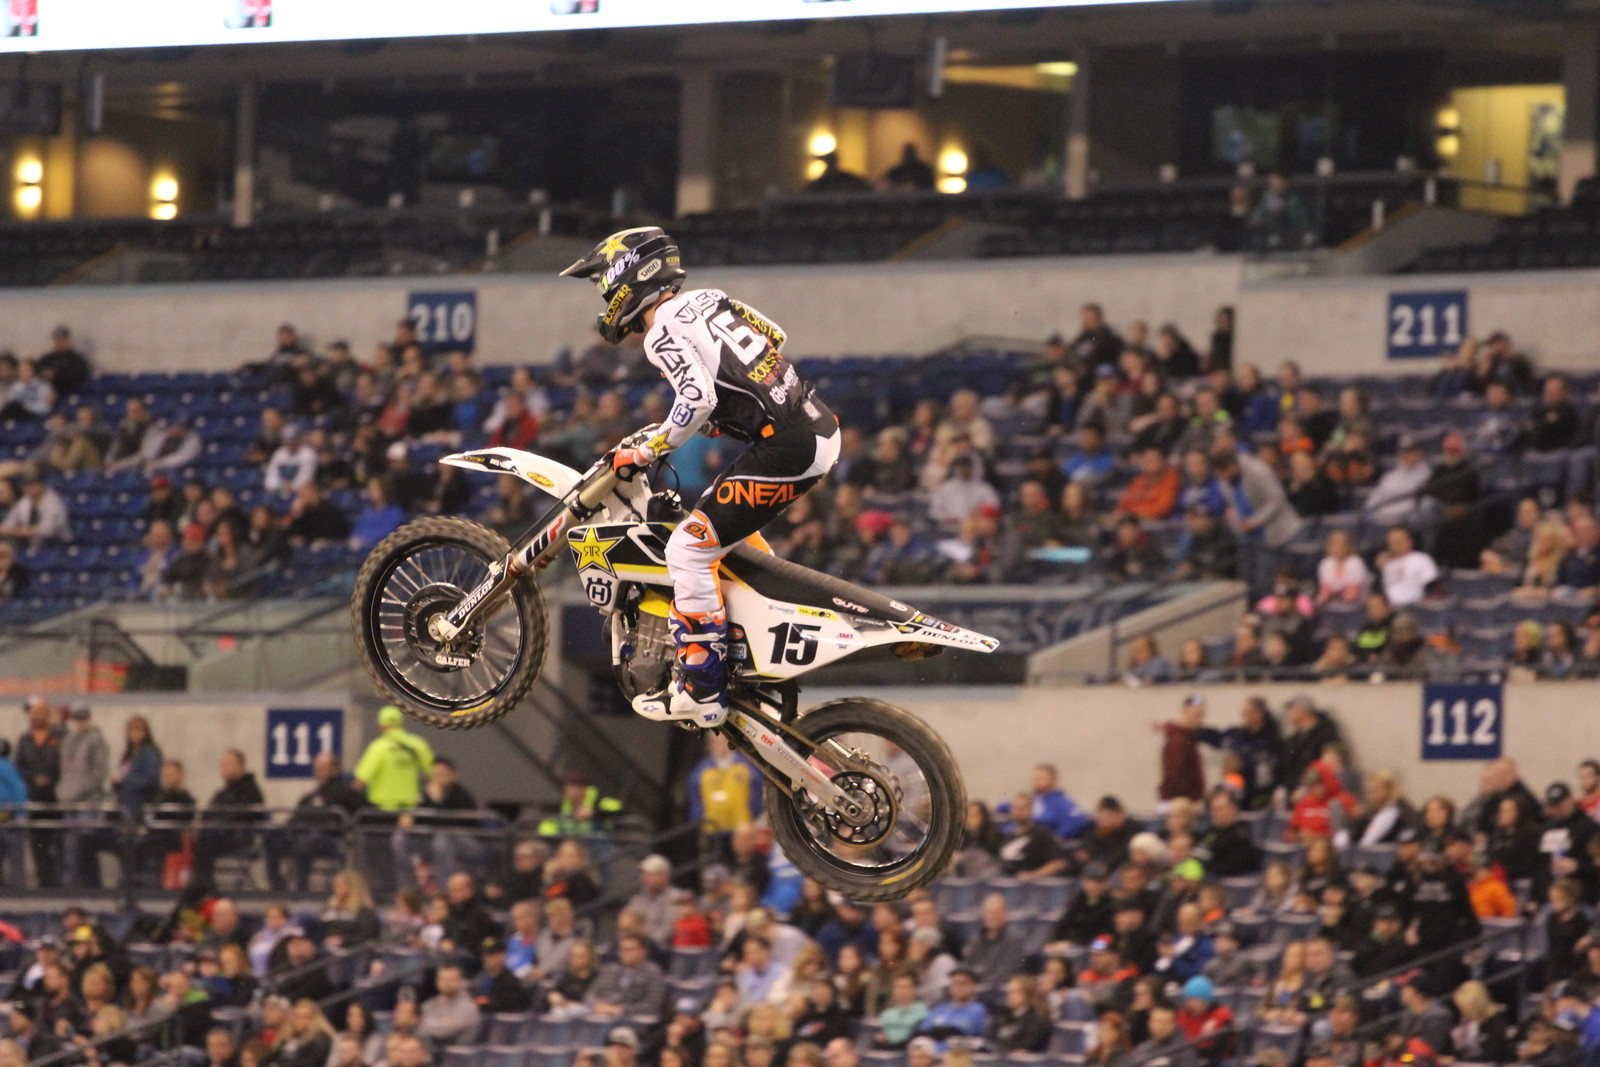 Dean Wilson - midwest_moto_media - Motocross Pictures - Vital MX